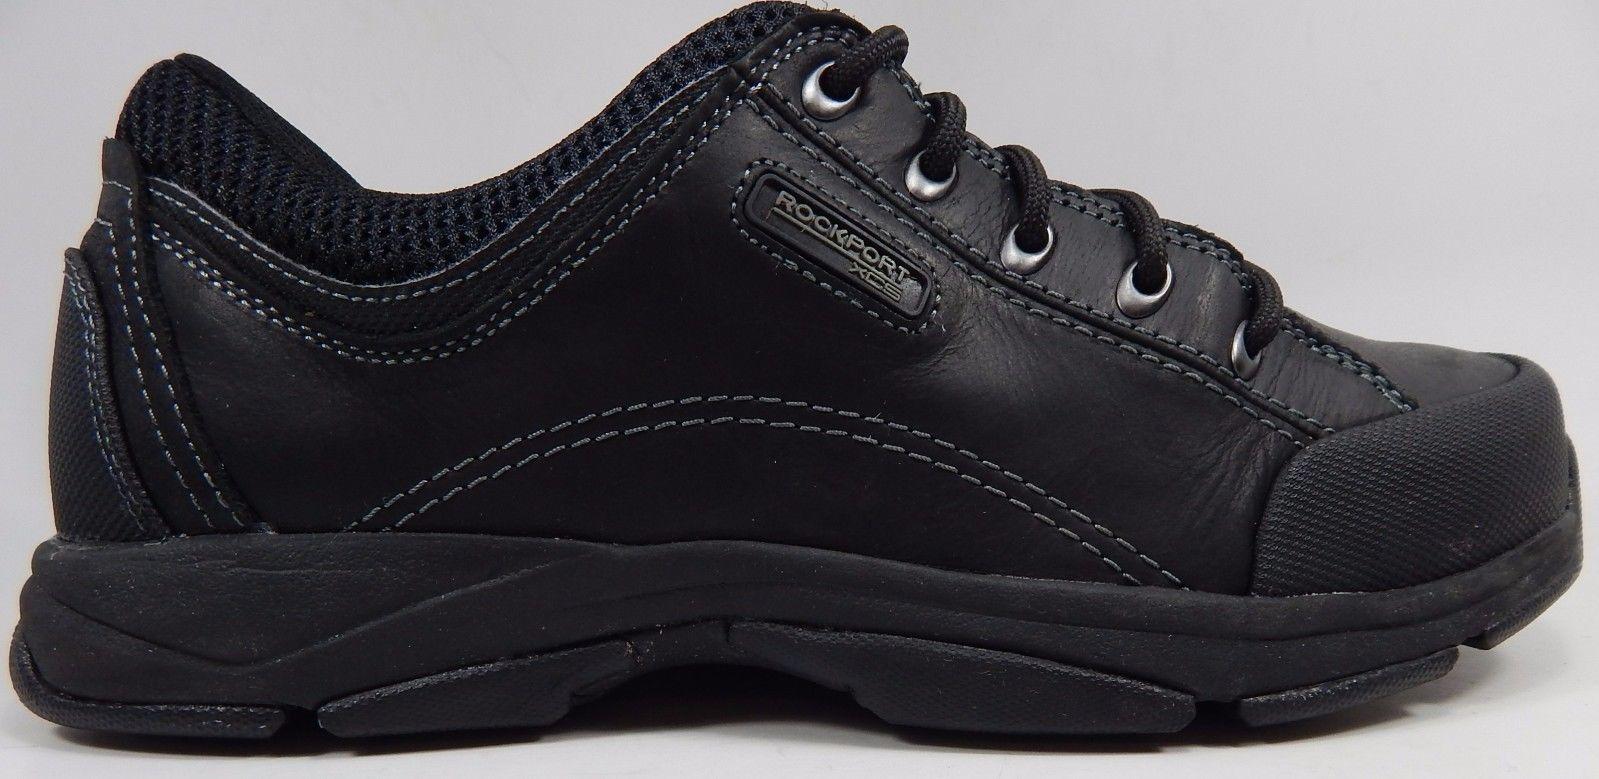 Rockport XCS Chranson Rugged Men's Lace Up Walking Sneakers Size US 8.5 M EU 42